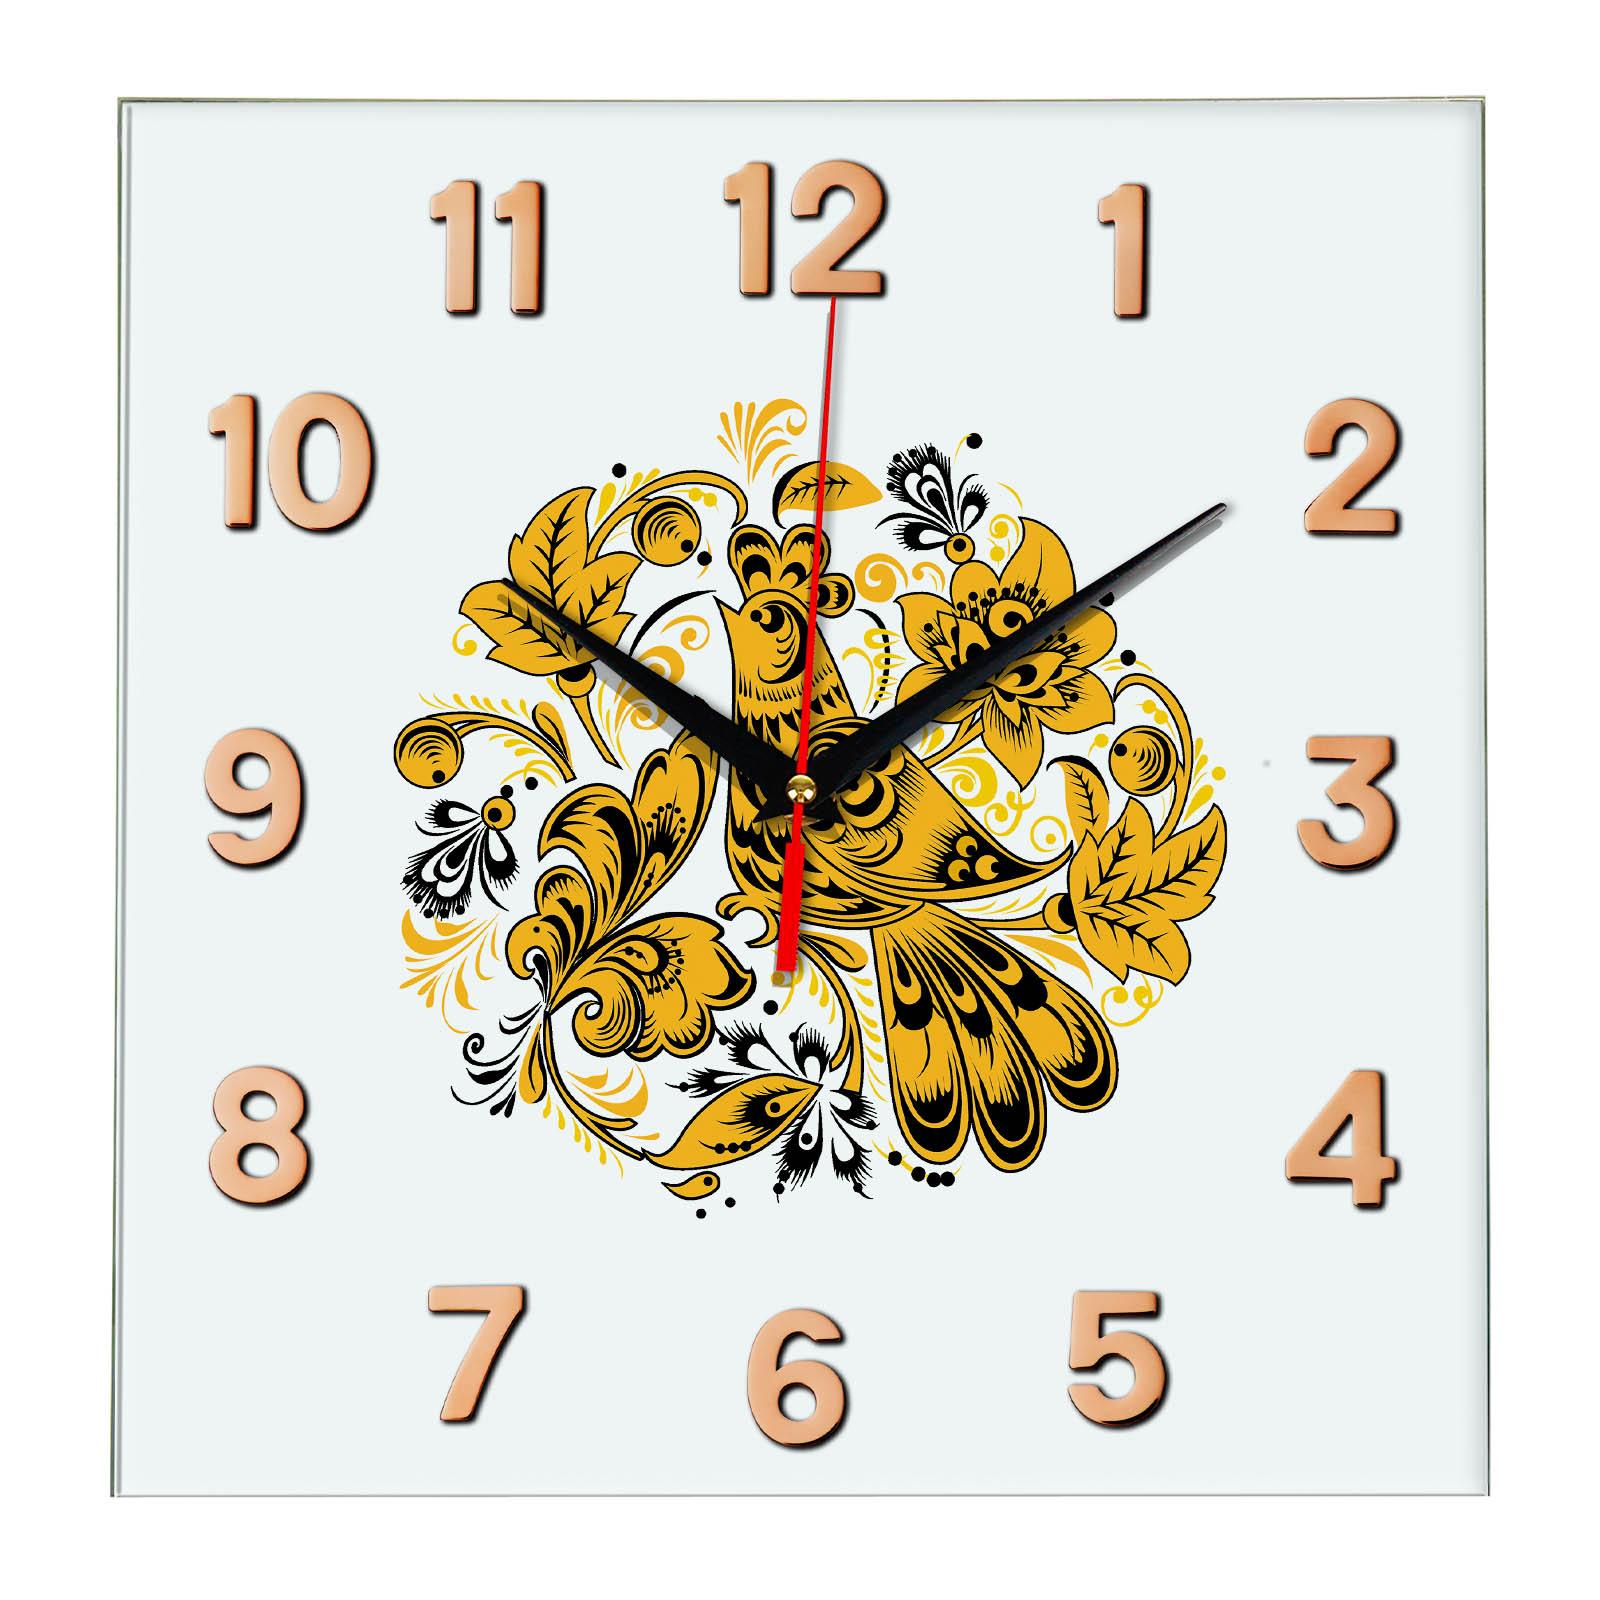 Народные промыслы часы Хохлома 5